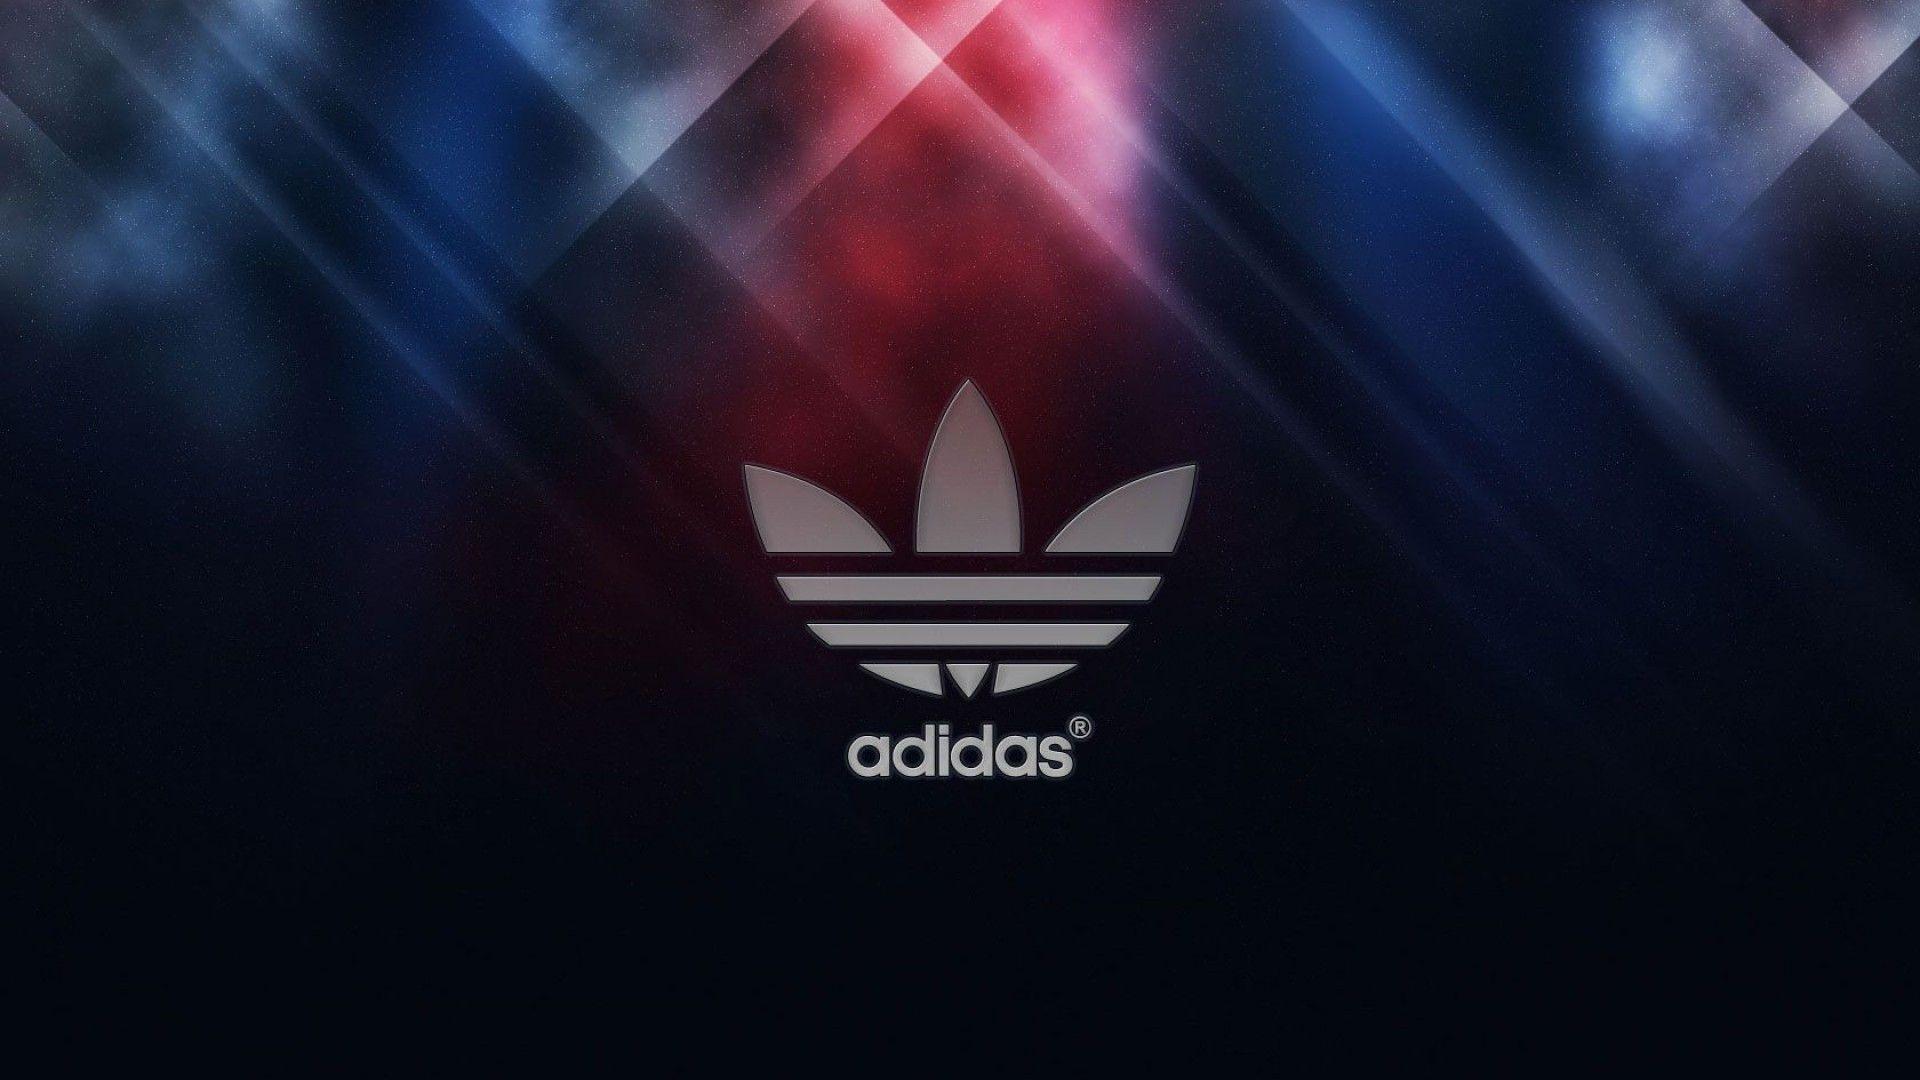 <b>Adidas 2015 Wallpaper</b> - WallpaperSafari